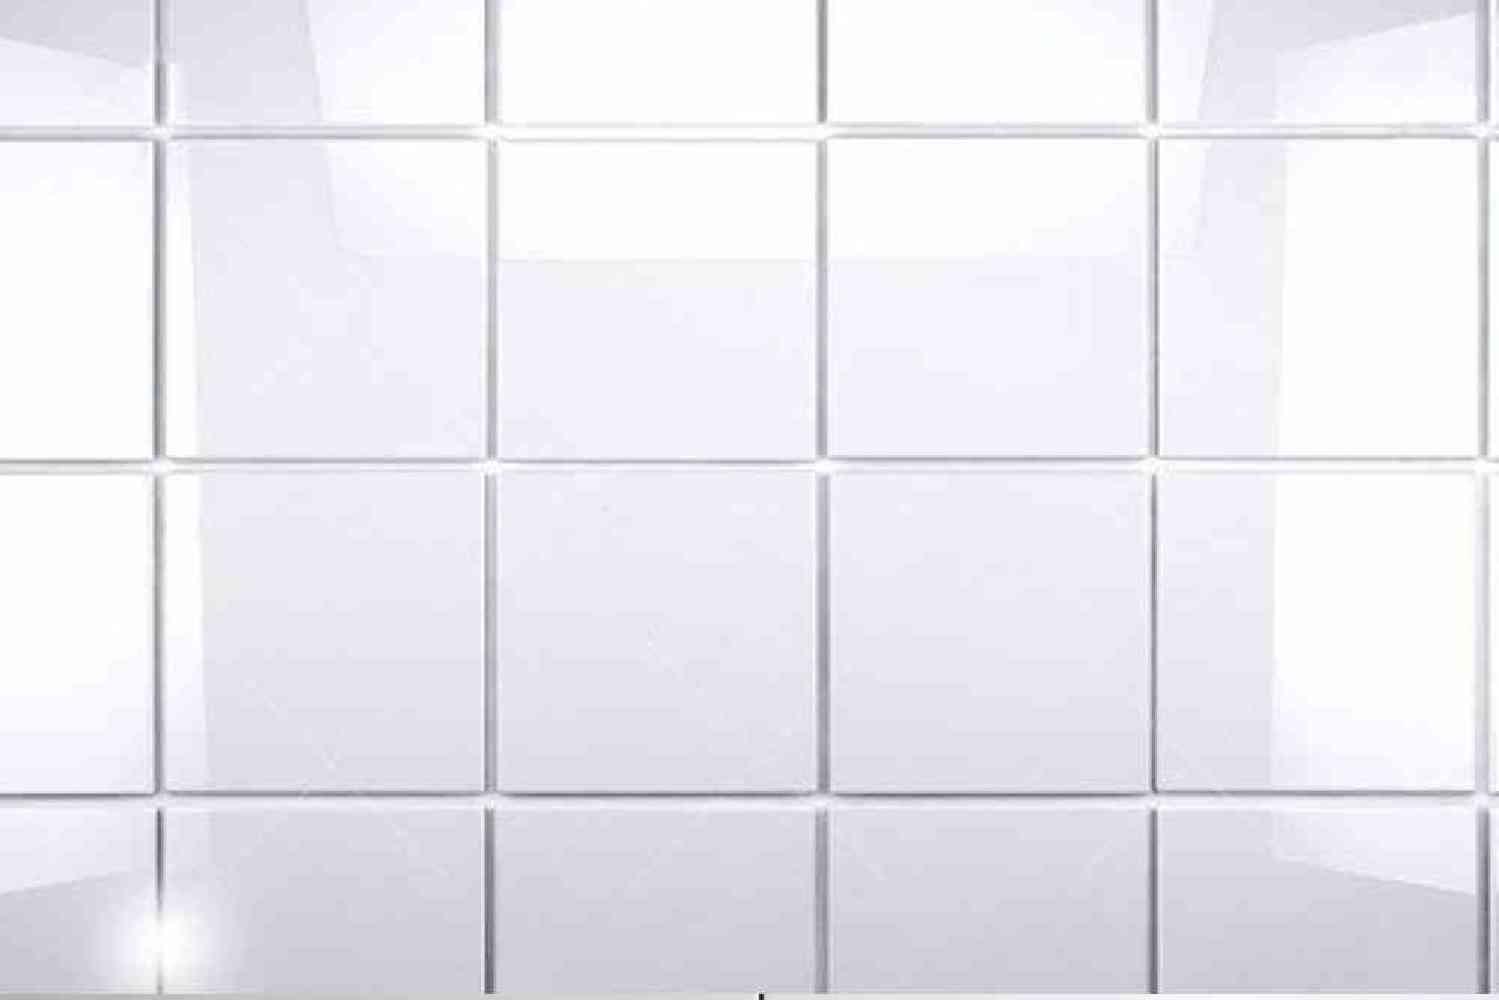 Carrelage 20x20 Blanc Brillant Comptoir Toulousain Carrelage